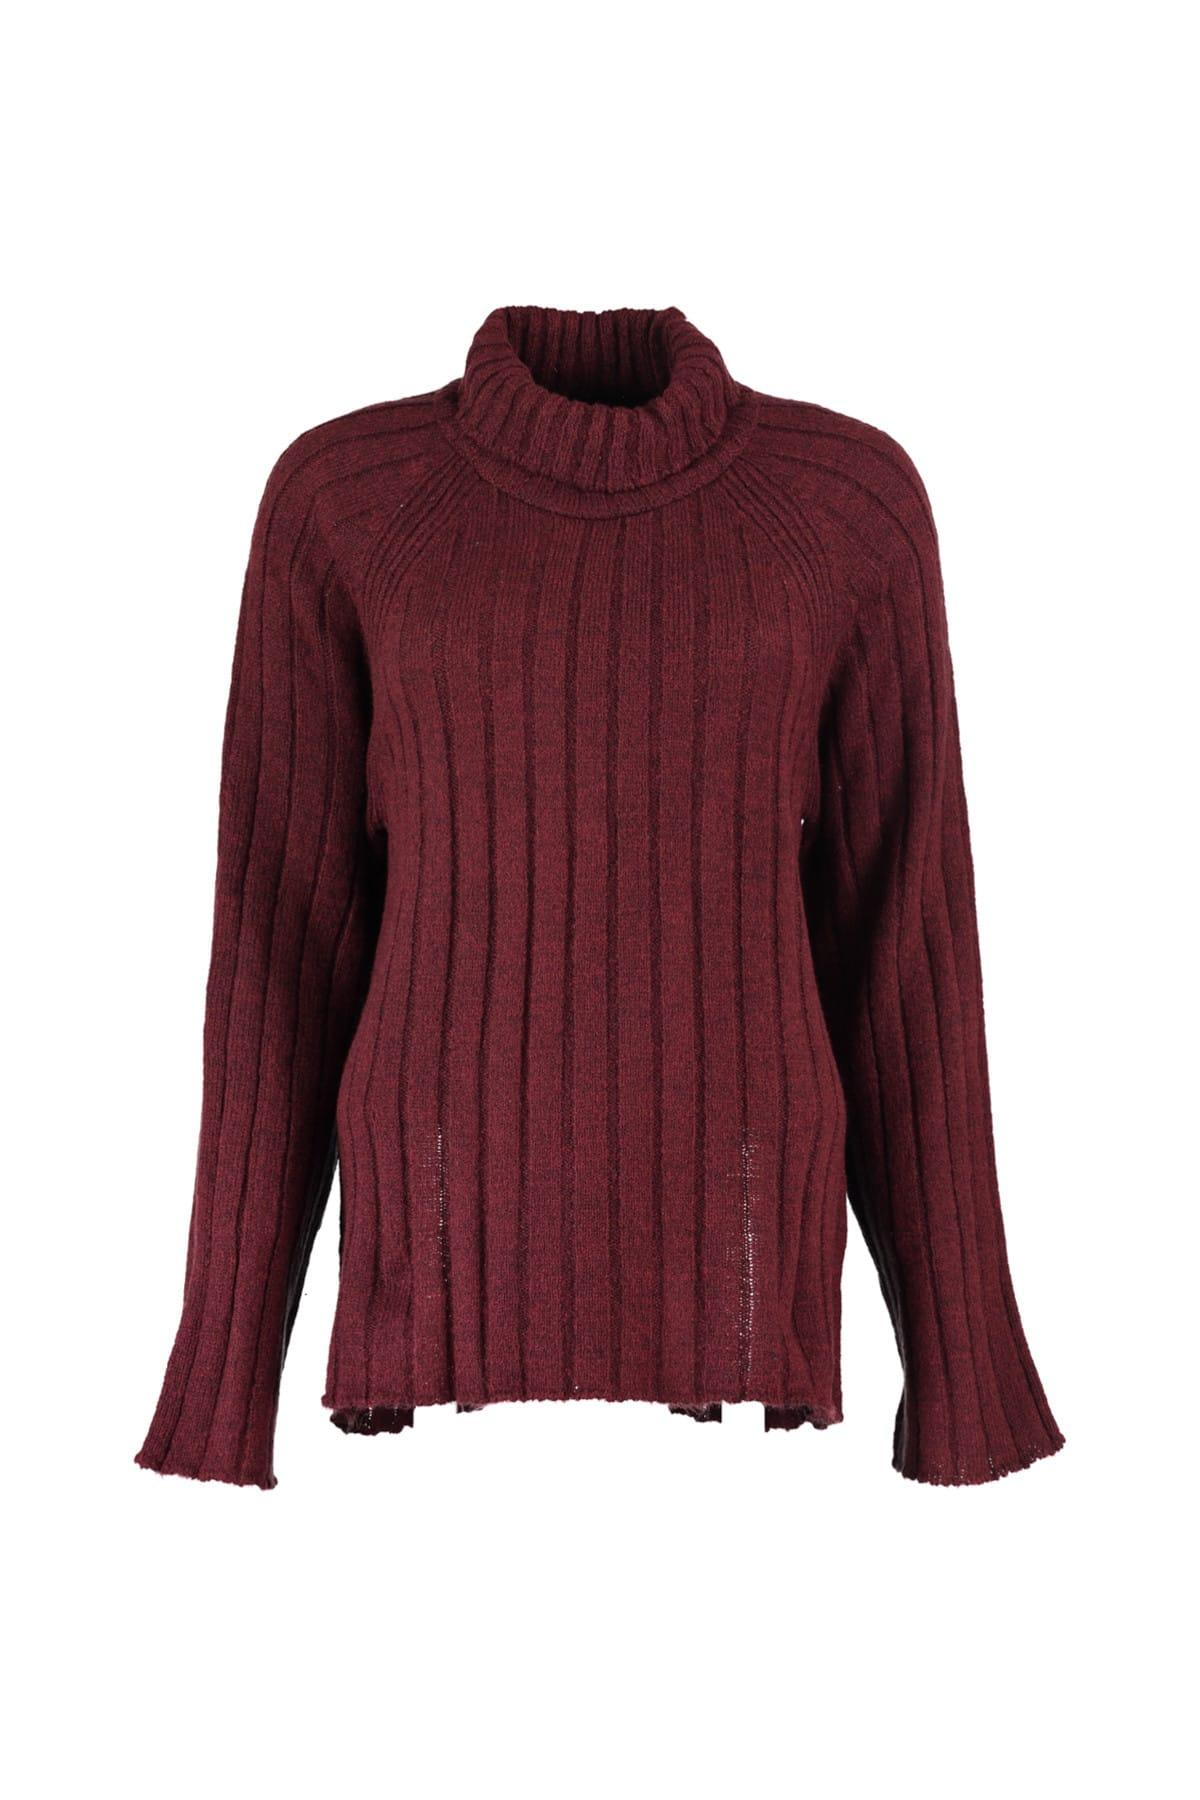 Trendyol WOMEN-Burgundy Ribbed Sweater Sweater TWOAW20ZA0043